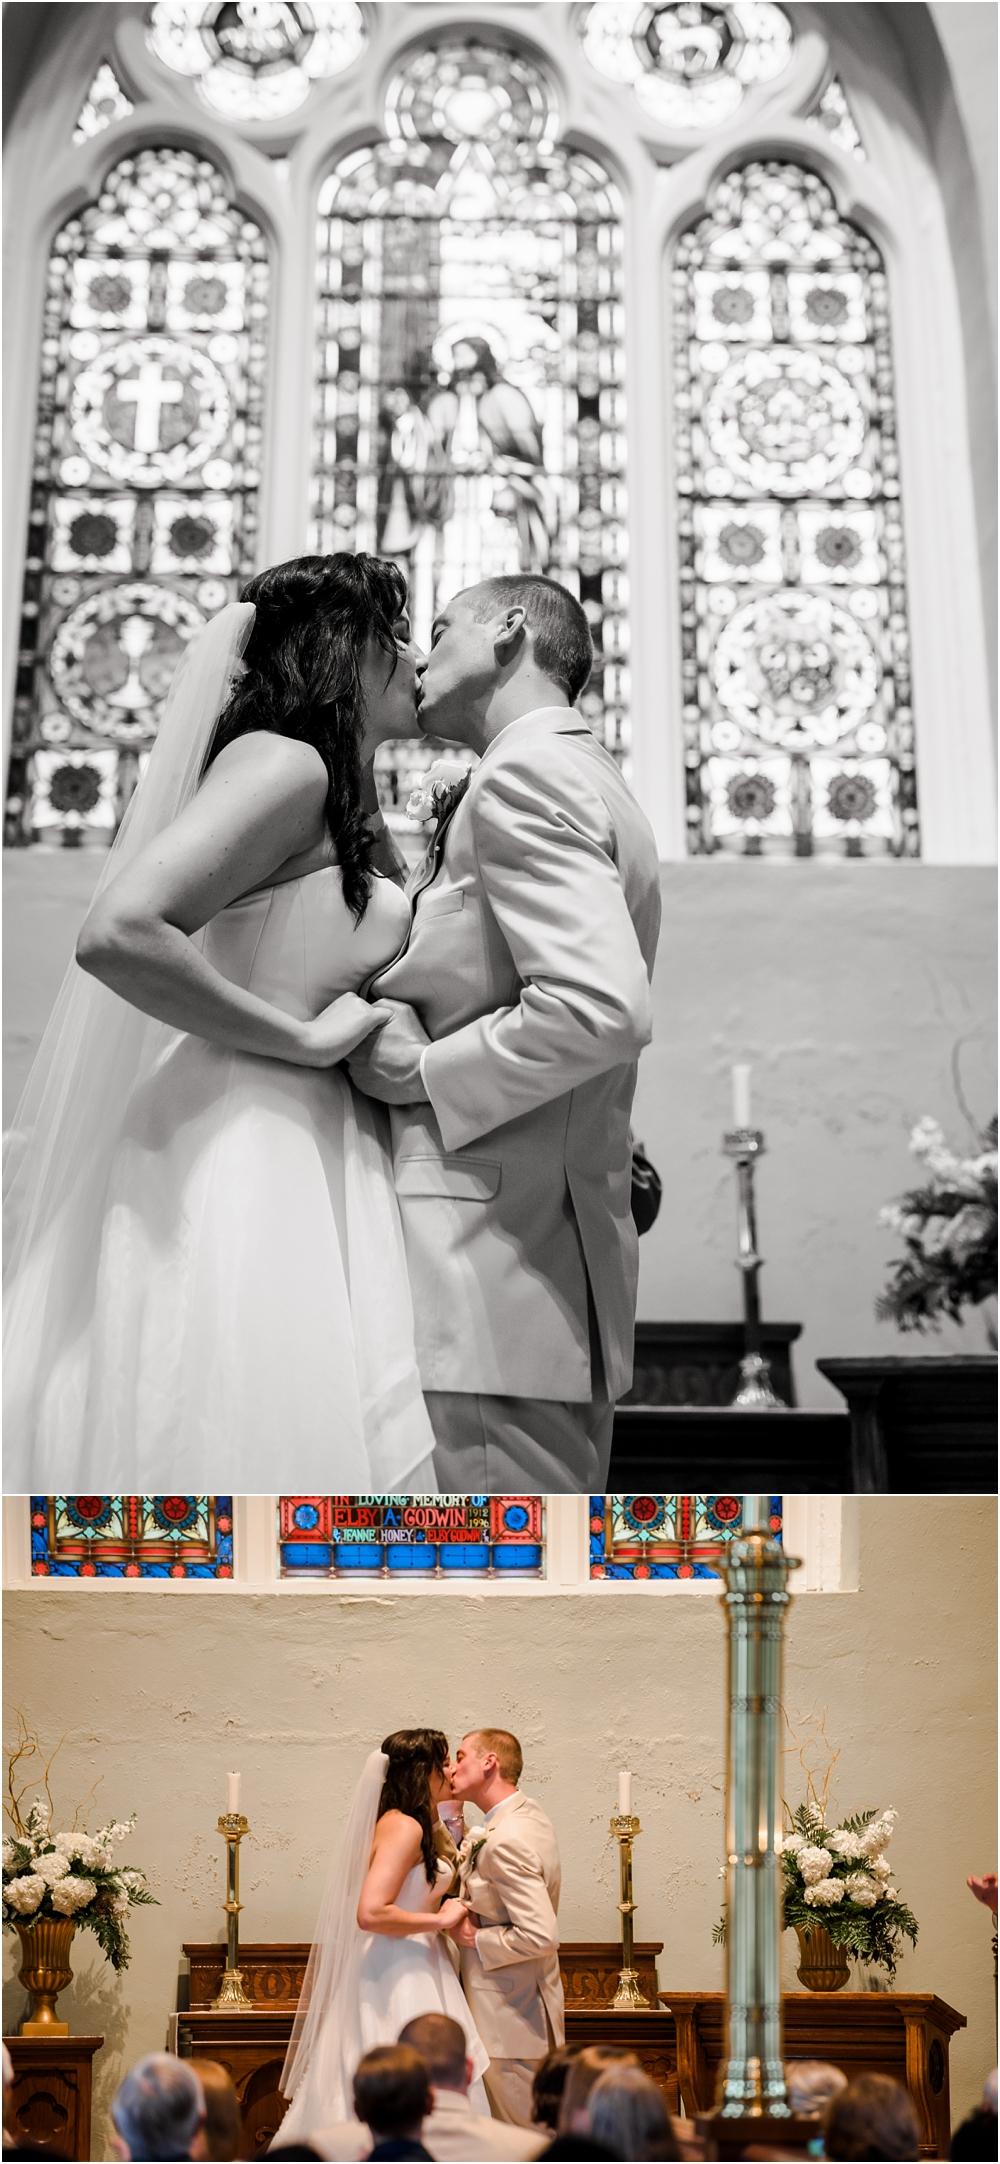 pensacola-wedding-photographer-kiersten-grant-97.jpg